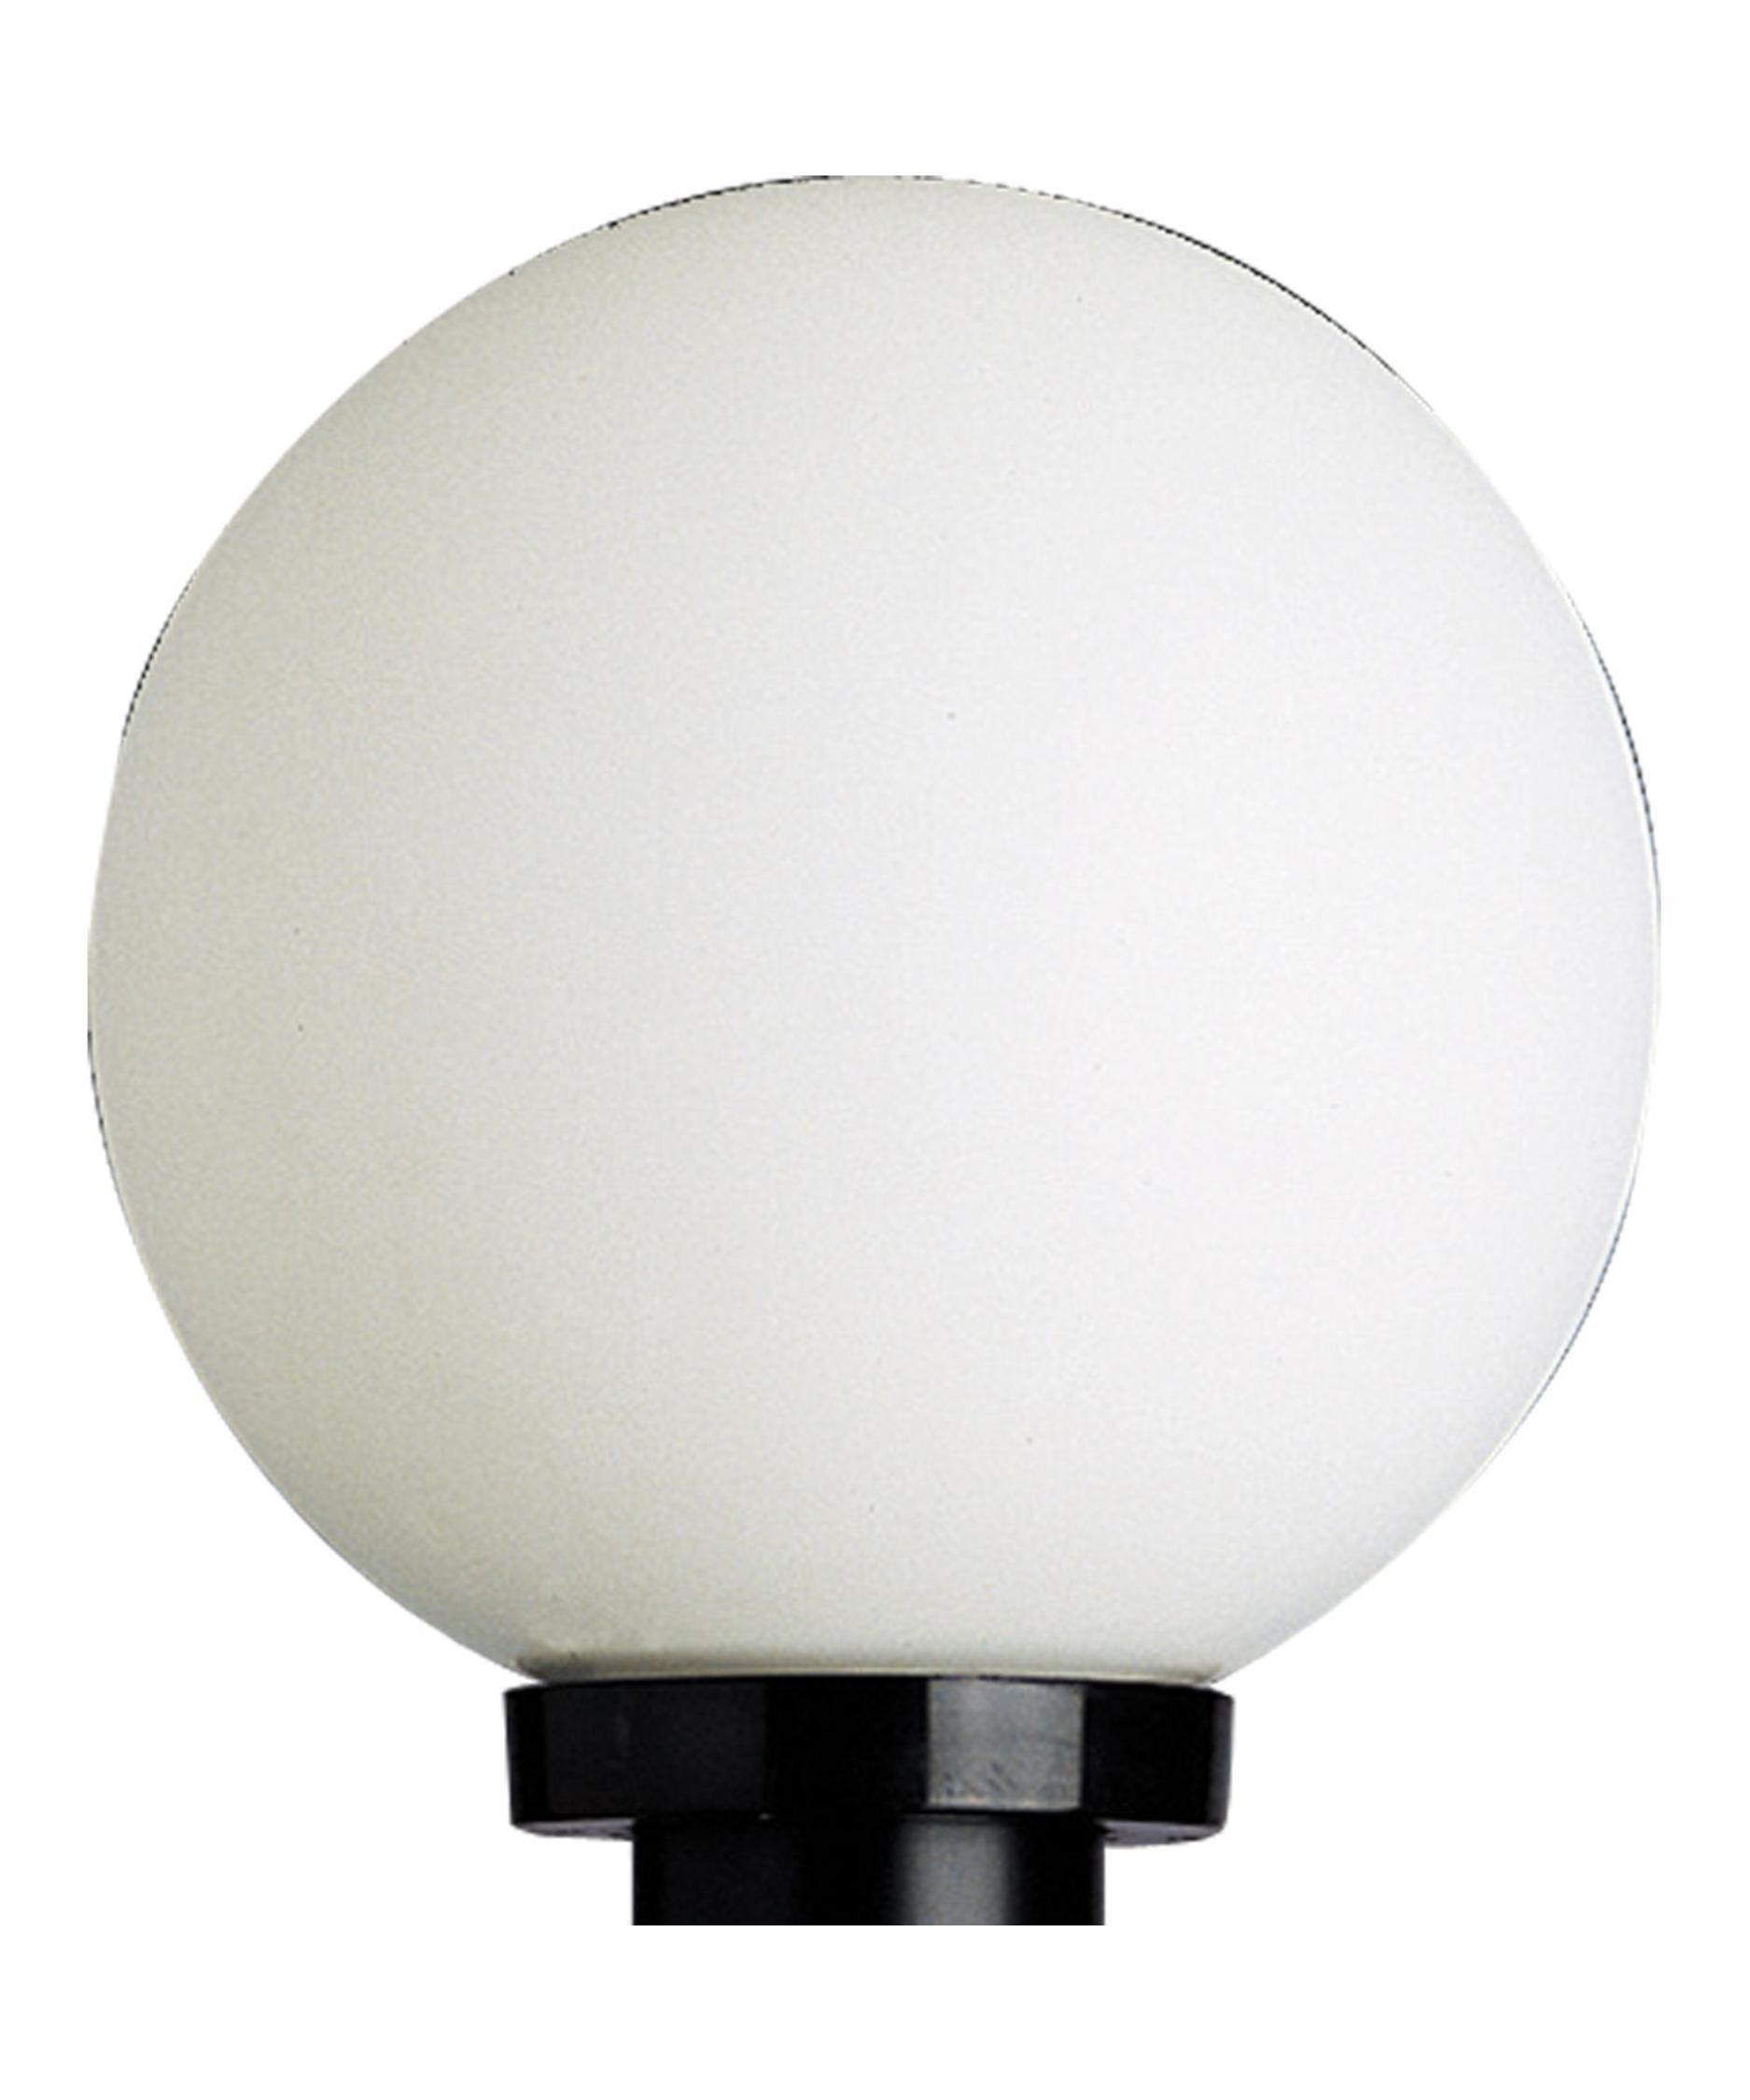 Progress Lighting P5478 Globe 10 Inch Wide 1 Light Outdoor Post Lamp |  Capitol Lighting 1 800lighting.com